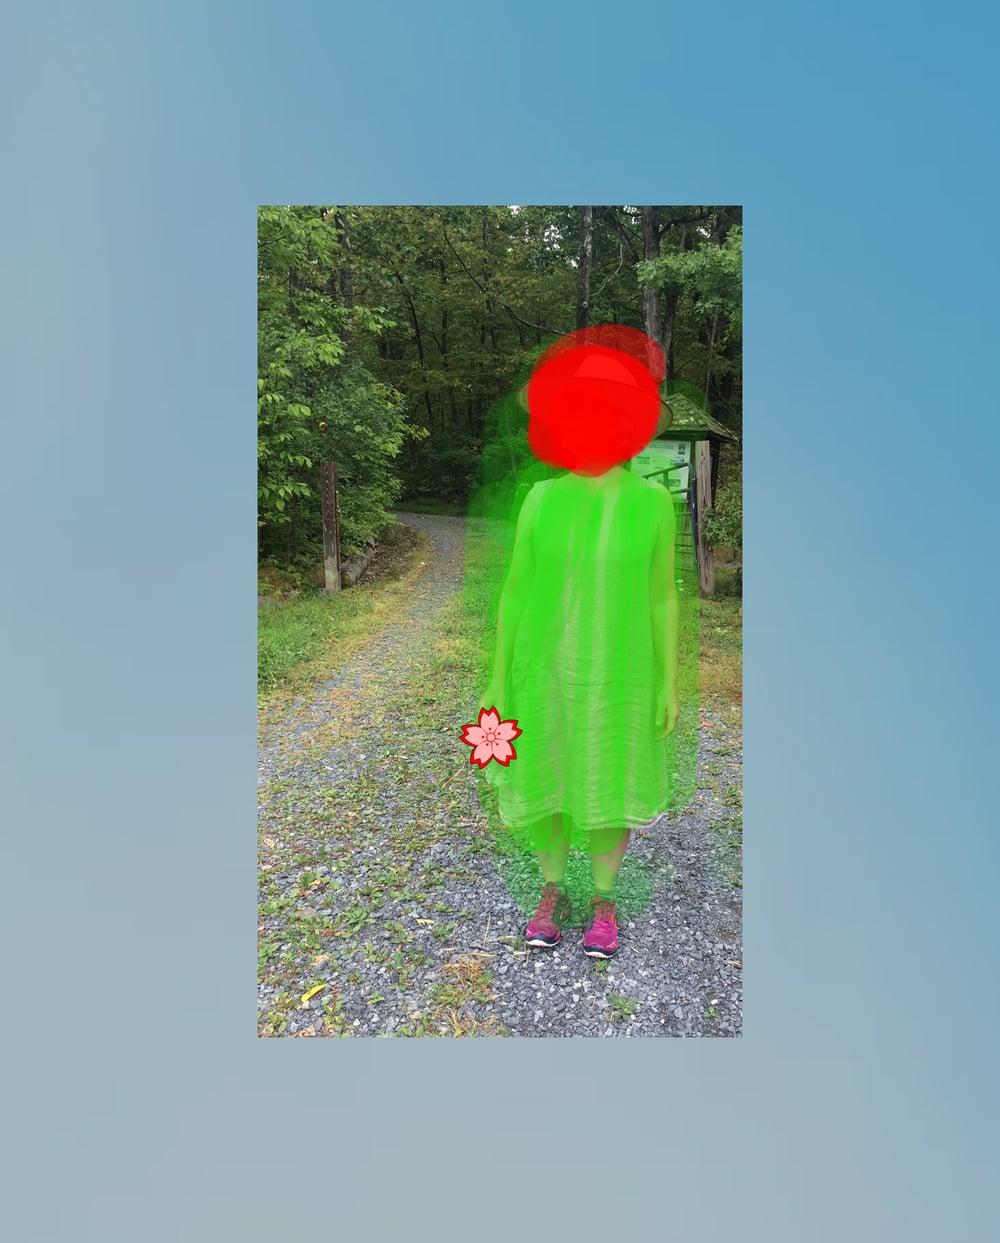 Print_RedHead3_8.25x10.25_prod.jpg